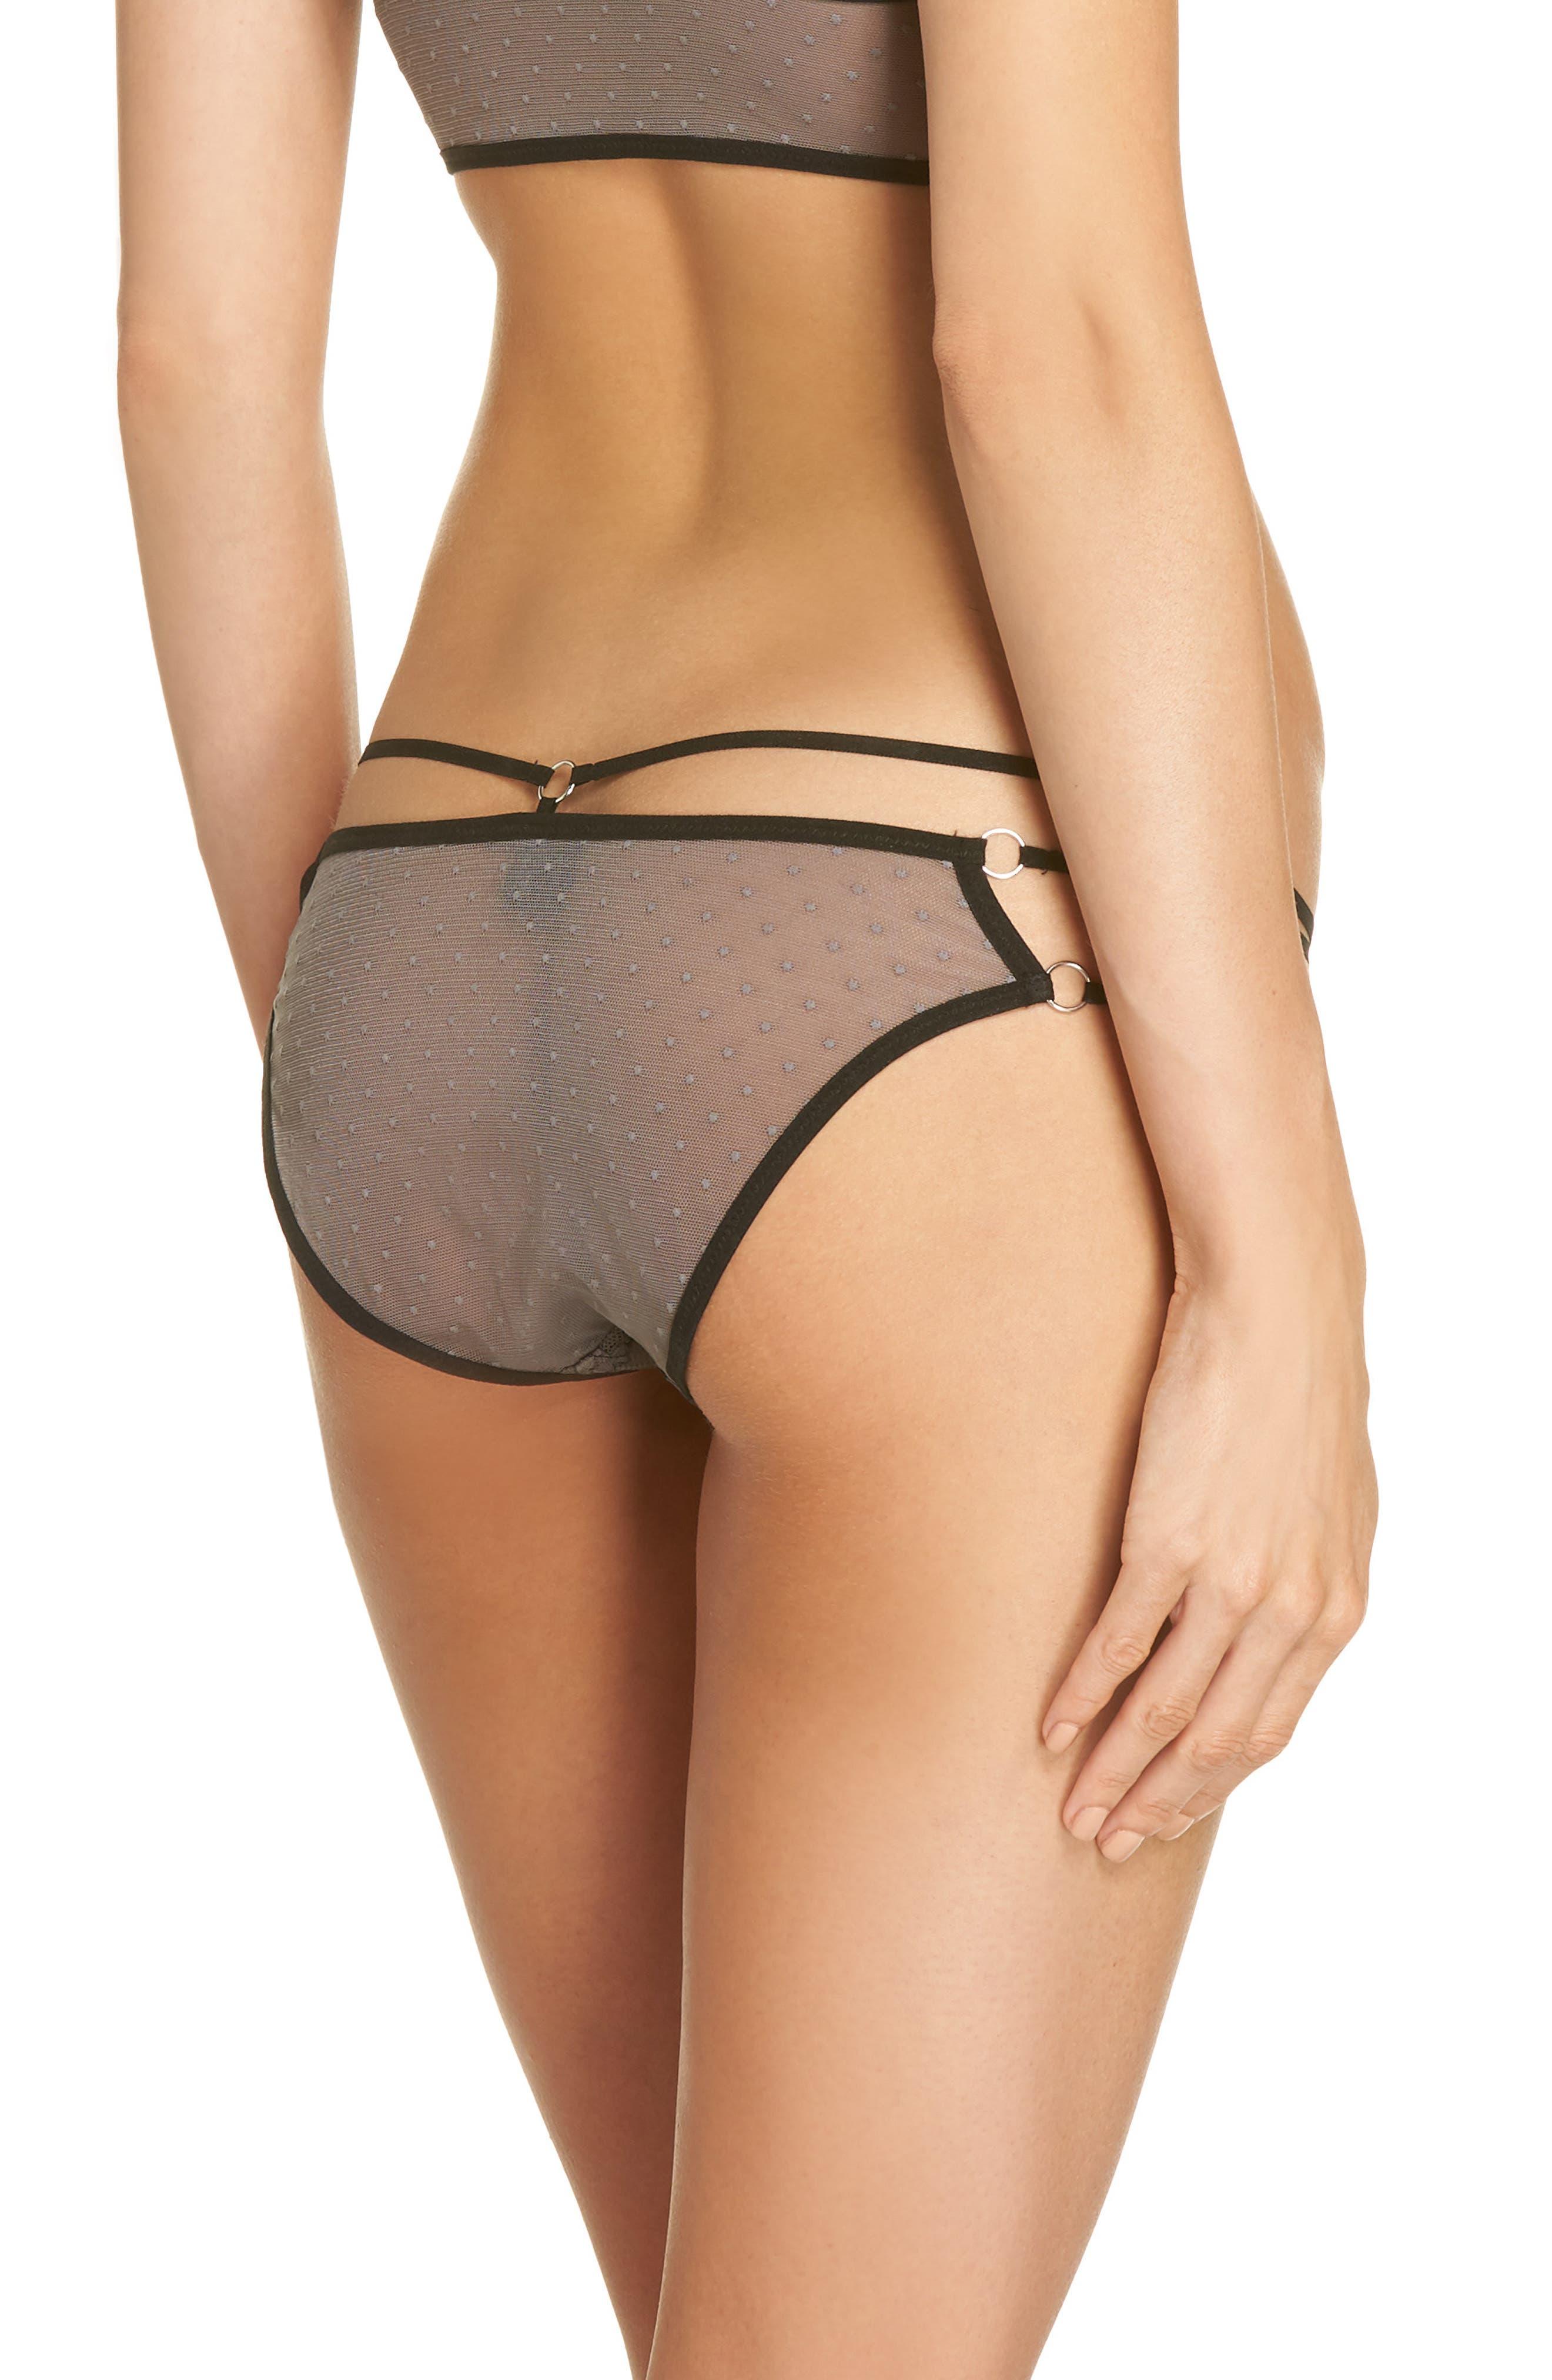 Thistle & Spire Constellation Lace Bikini,                             Alternate thumbnail 2, color,                             Steel